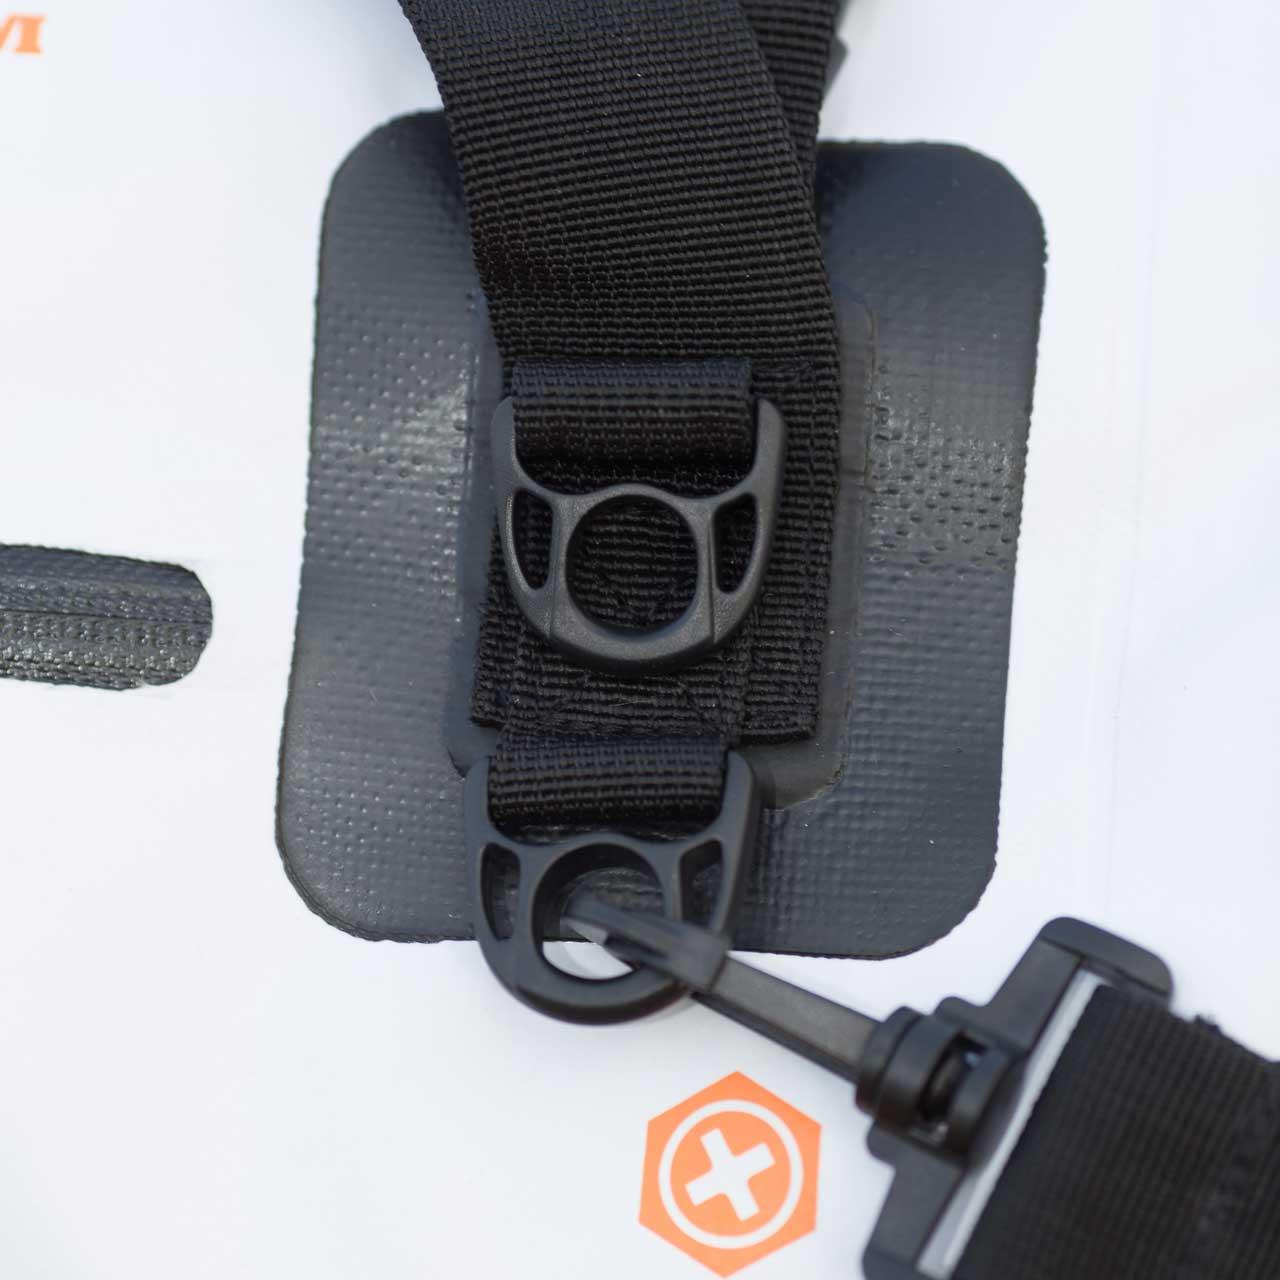 Close up of the bag's shoulder strap clips